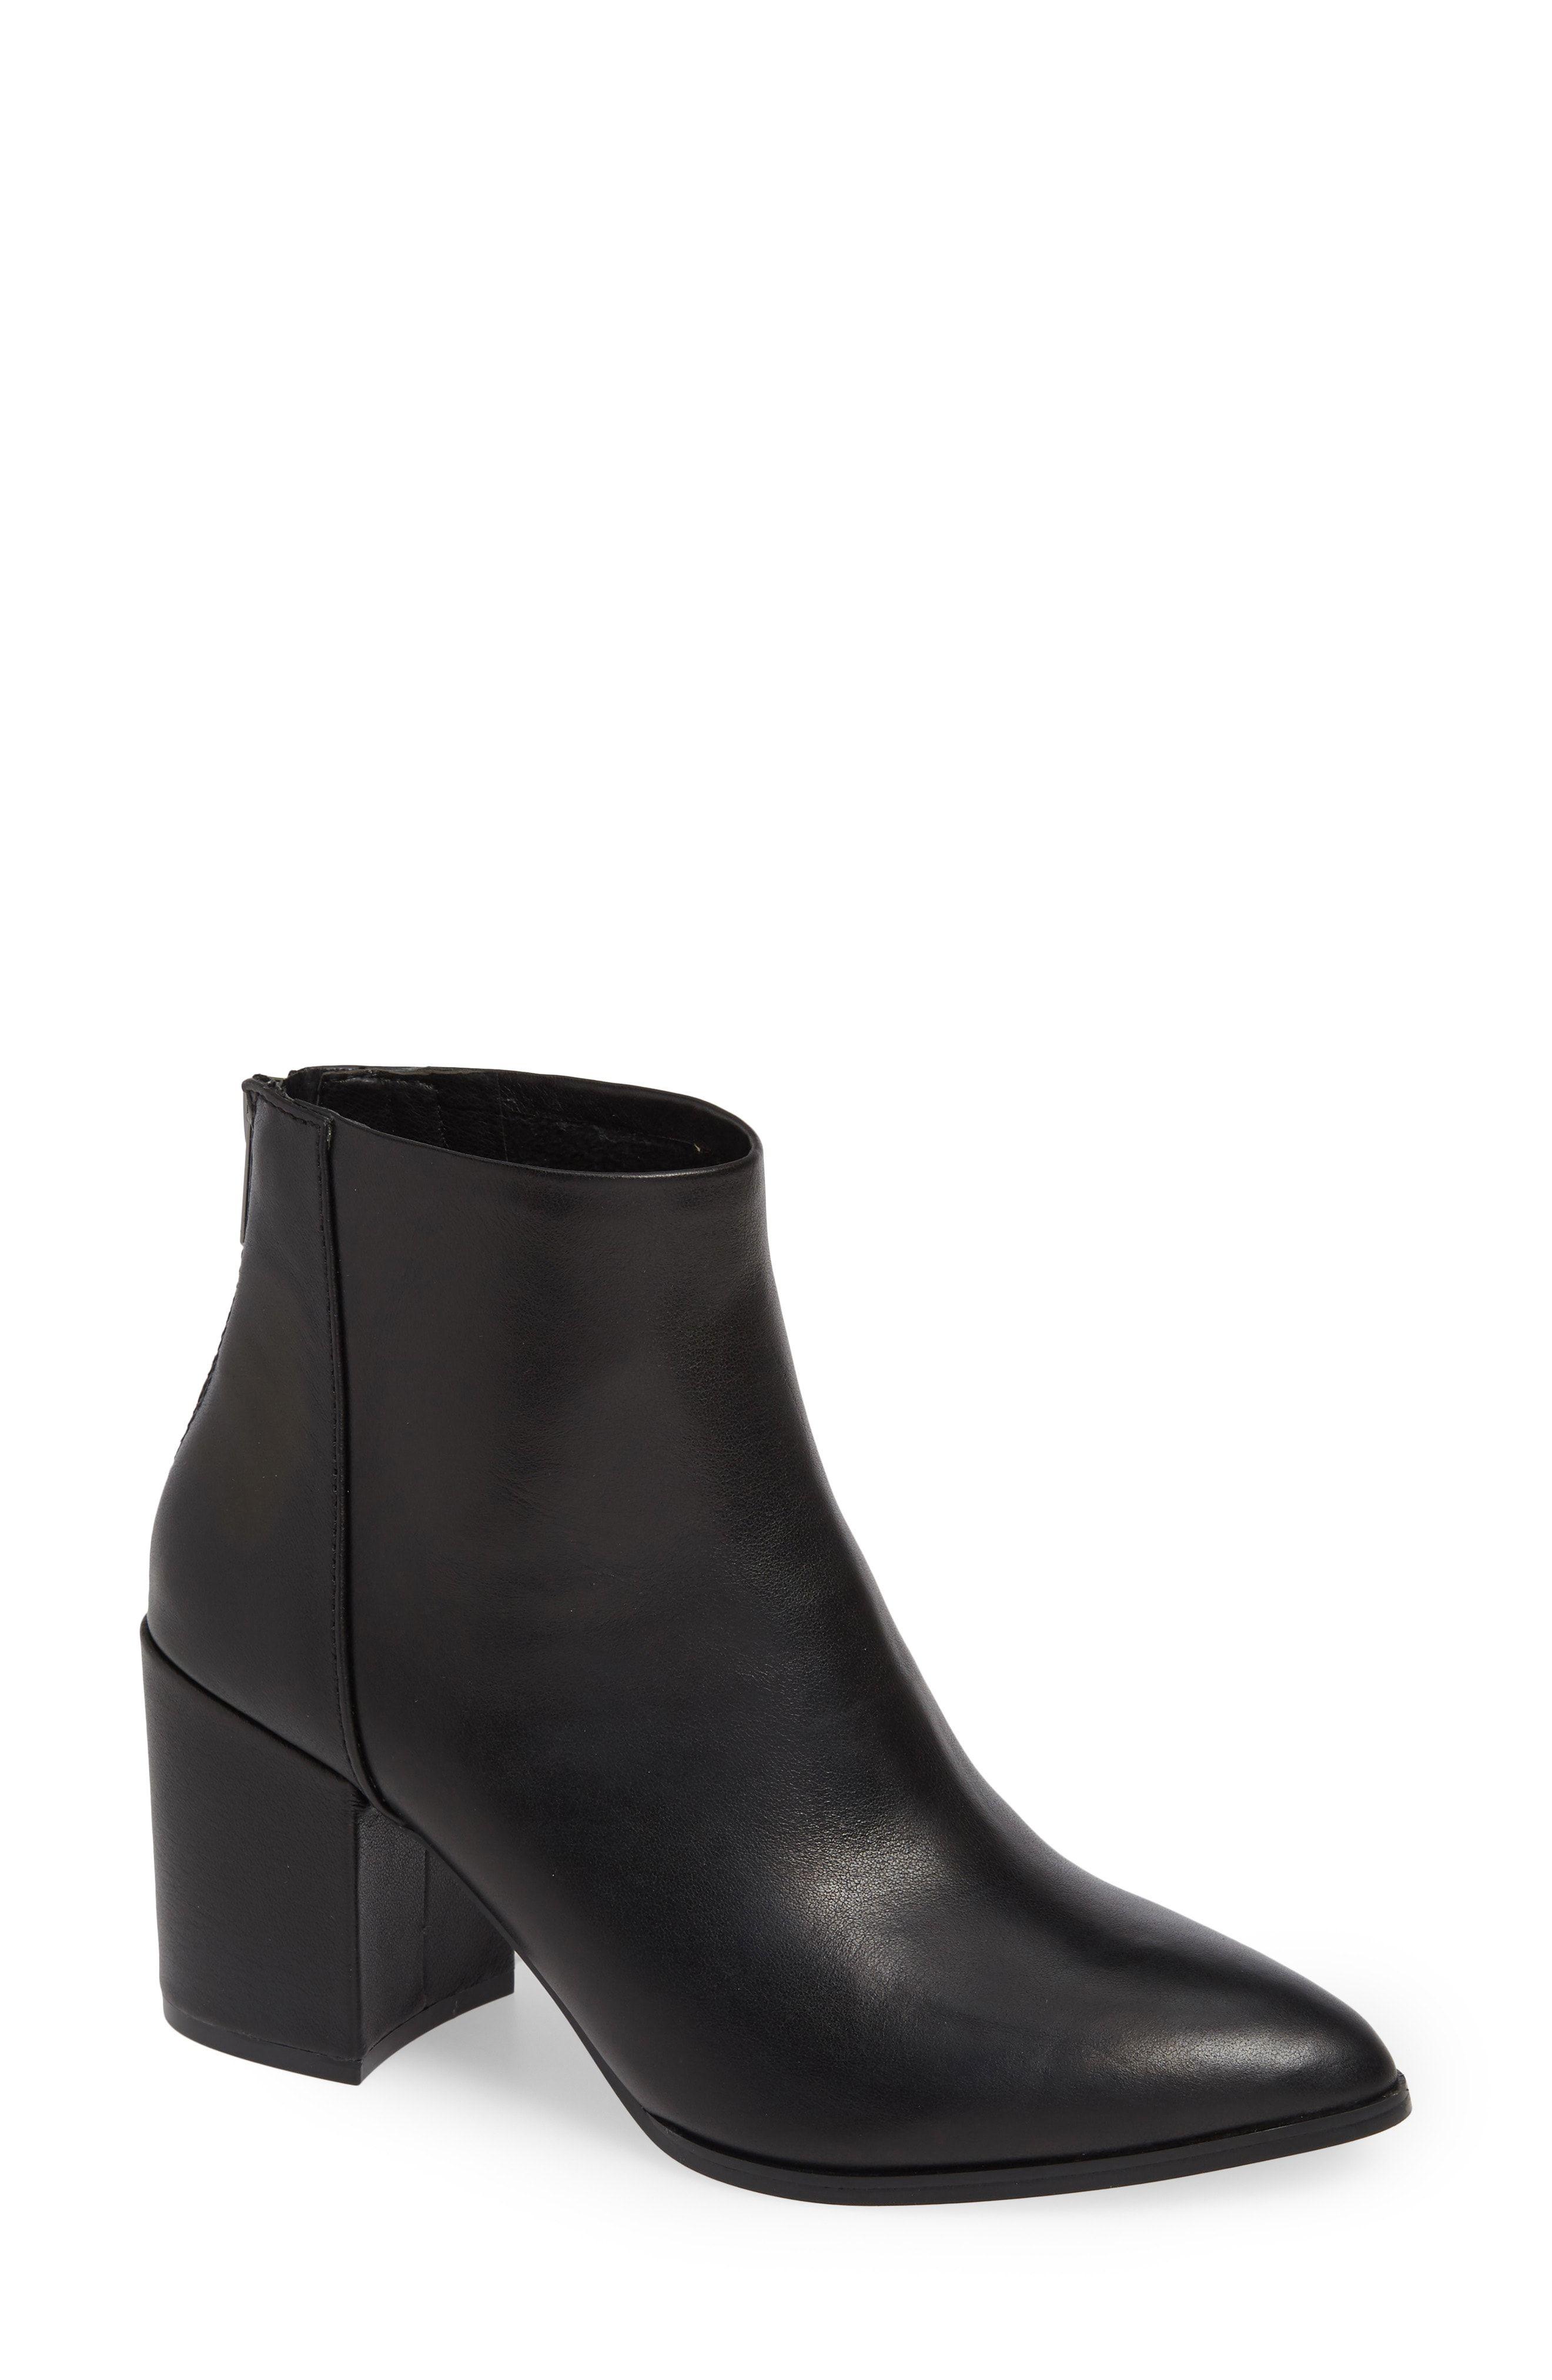 3a9f4c6906a steve madden jillian black leather chunky heel pointy toe bootie ...